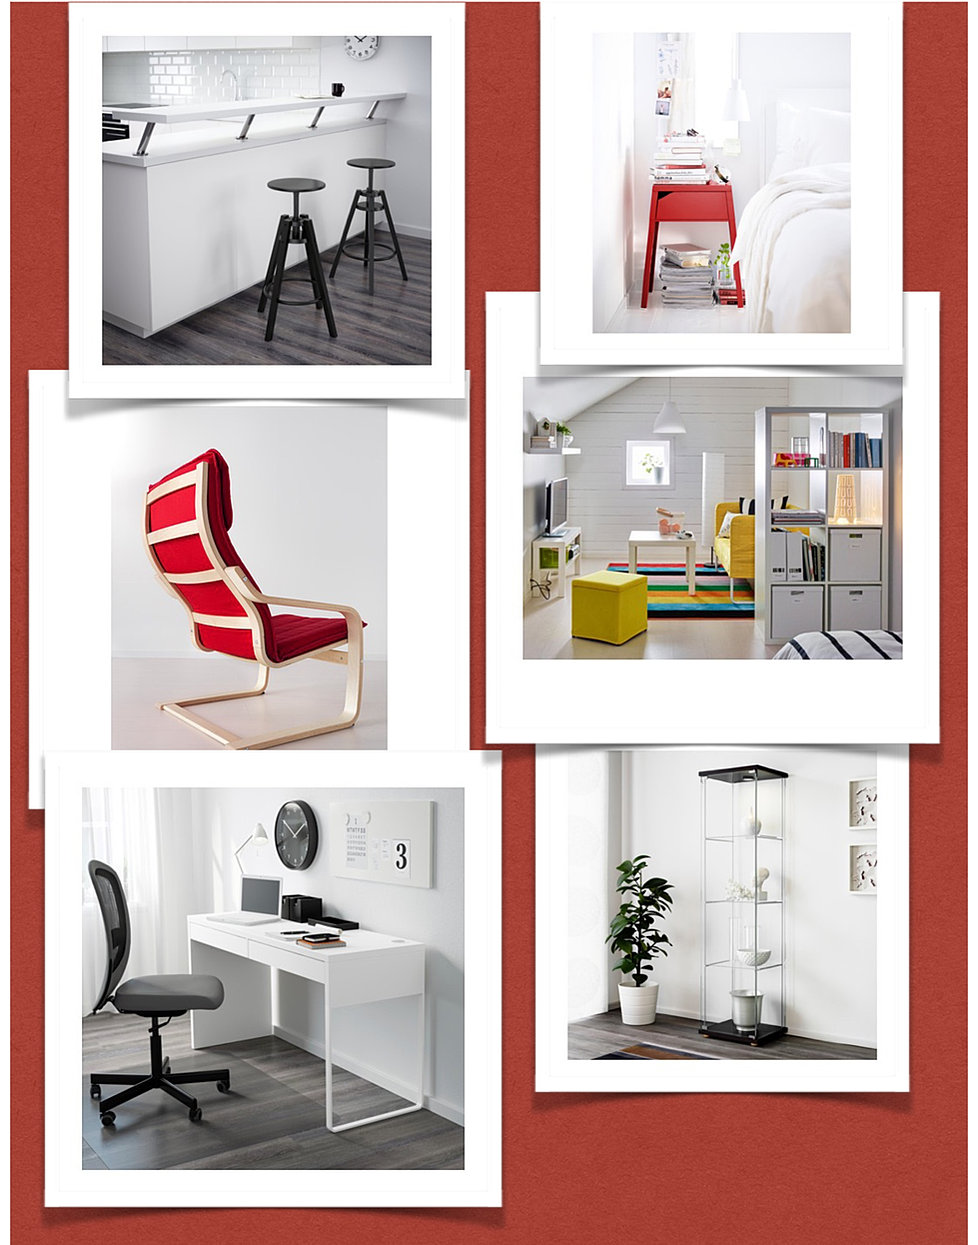 Ikea m xico muebles importados for Muebles ikea mexico